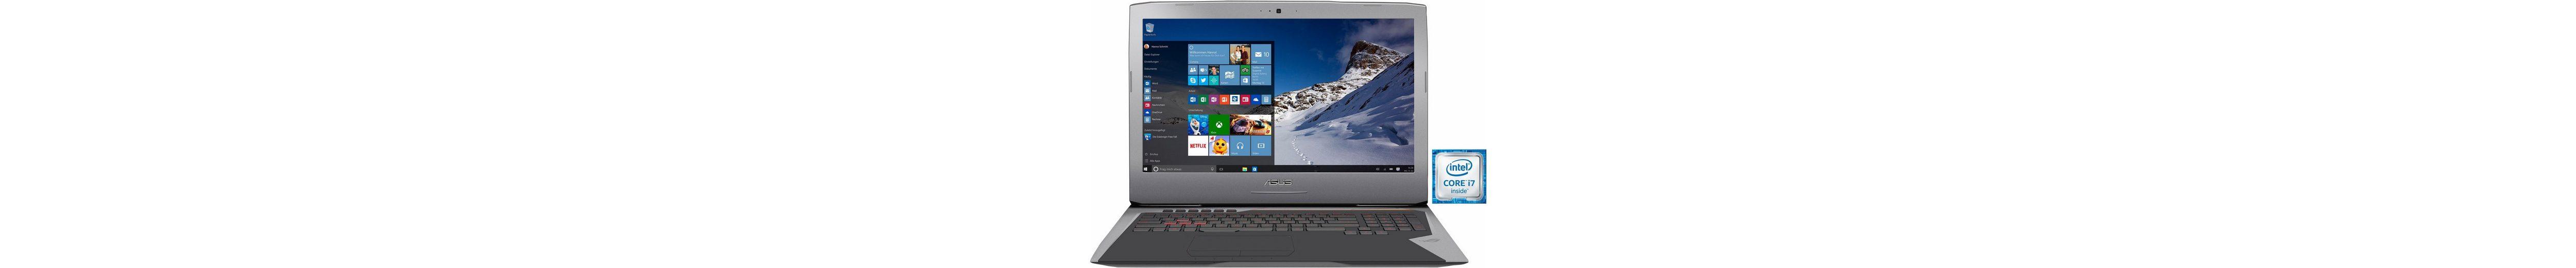 Asus G752VS-BA184T Notebook, Intel® Core™ i7, 43,9 cm (17,3 Zoll), 16384 MB DDR4-RAM